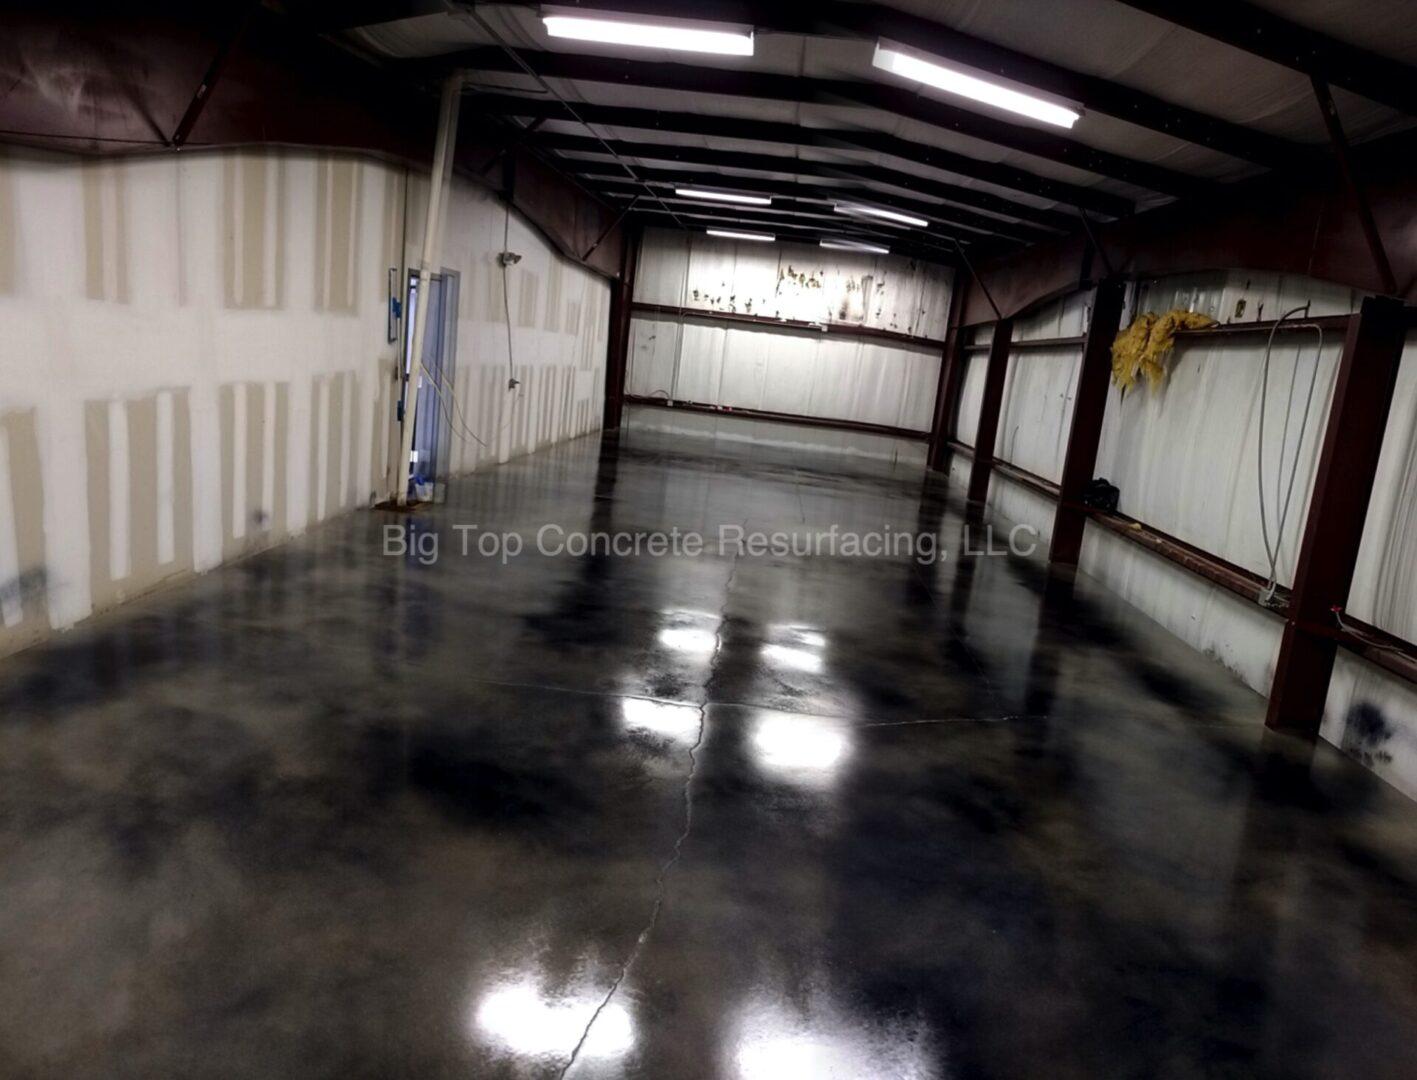 Concrete Staining Company Orlando